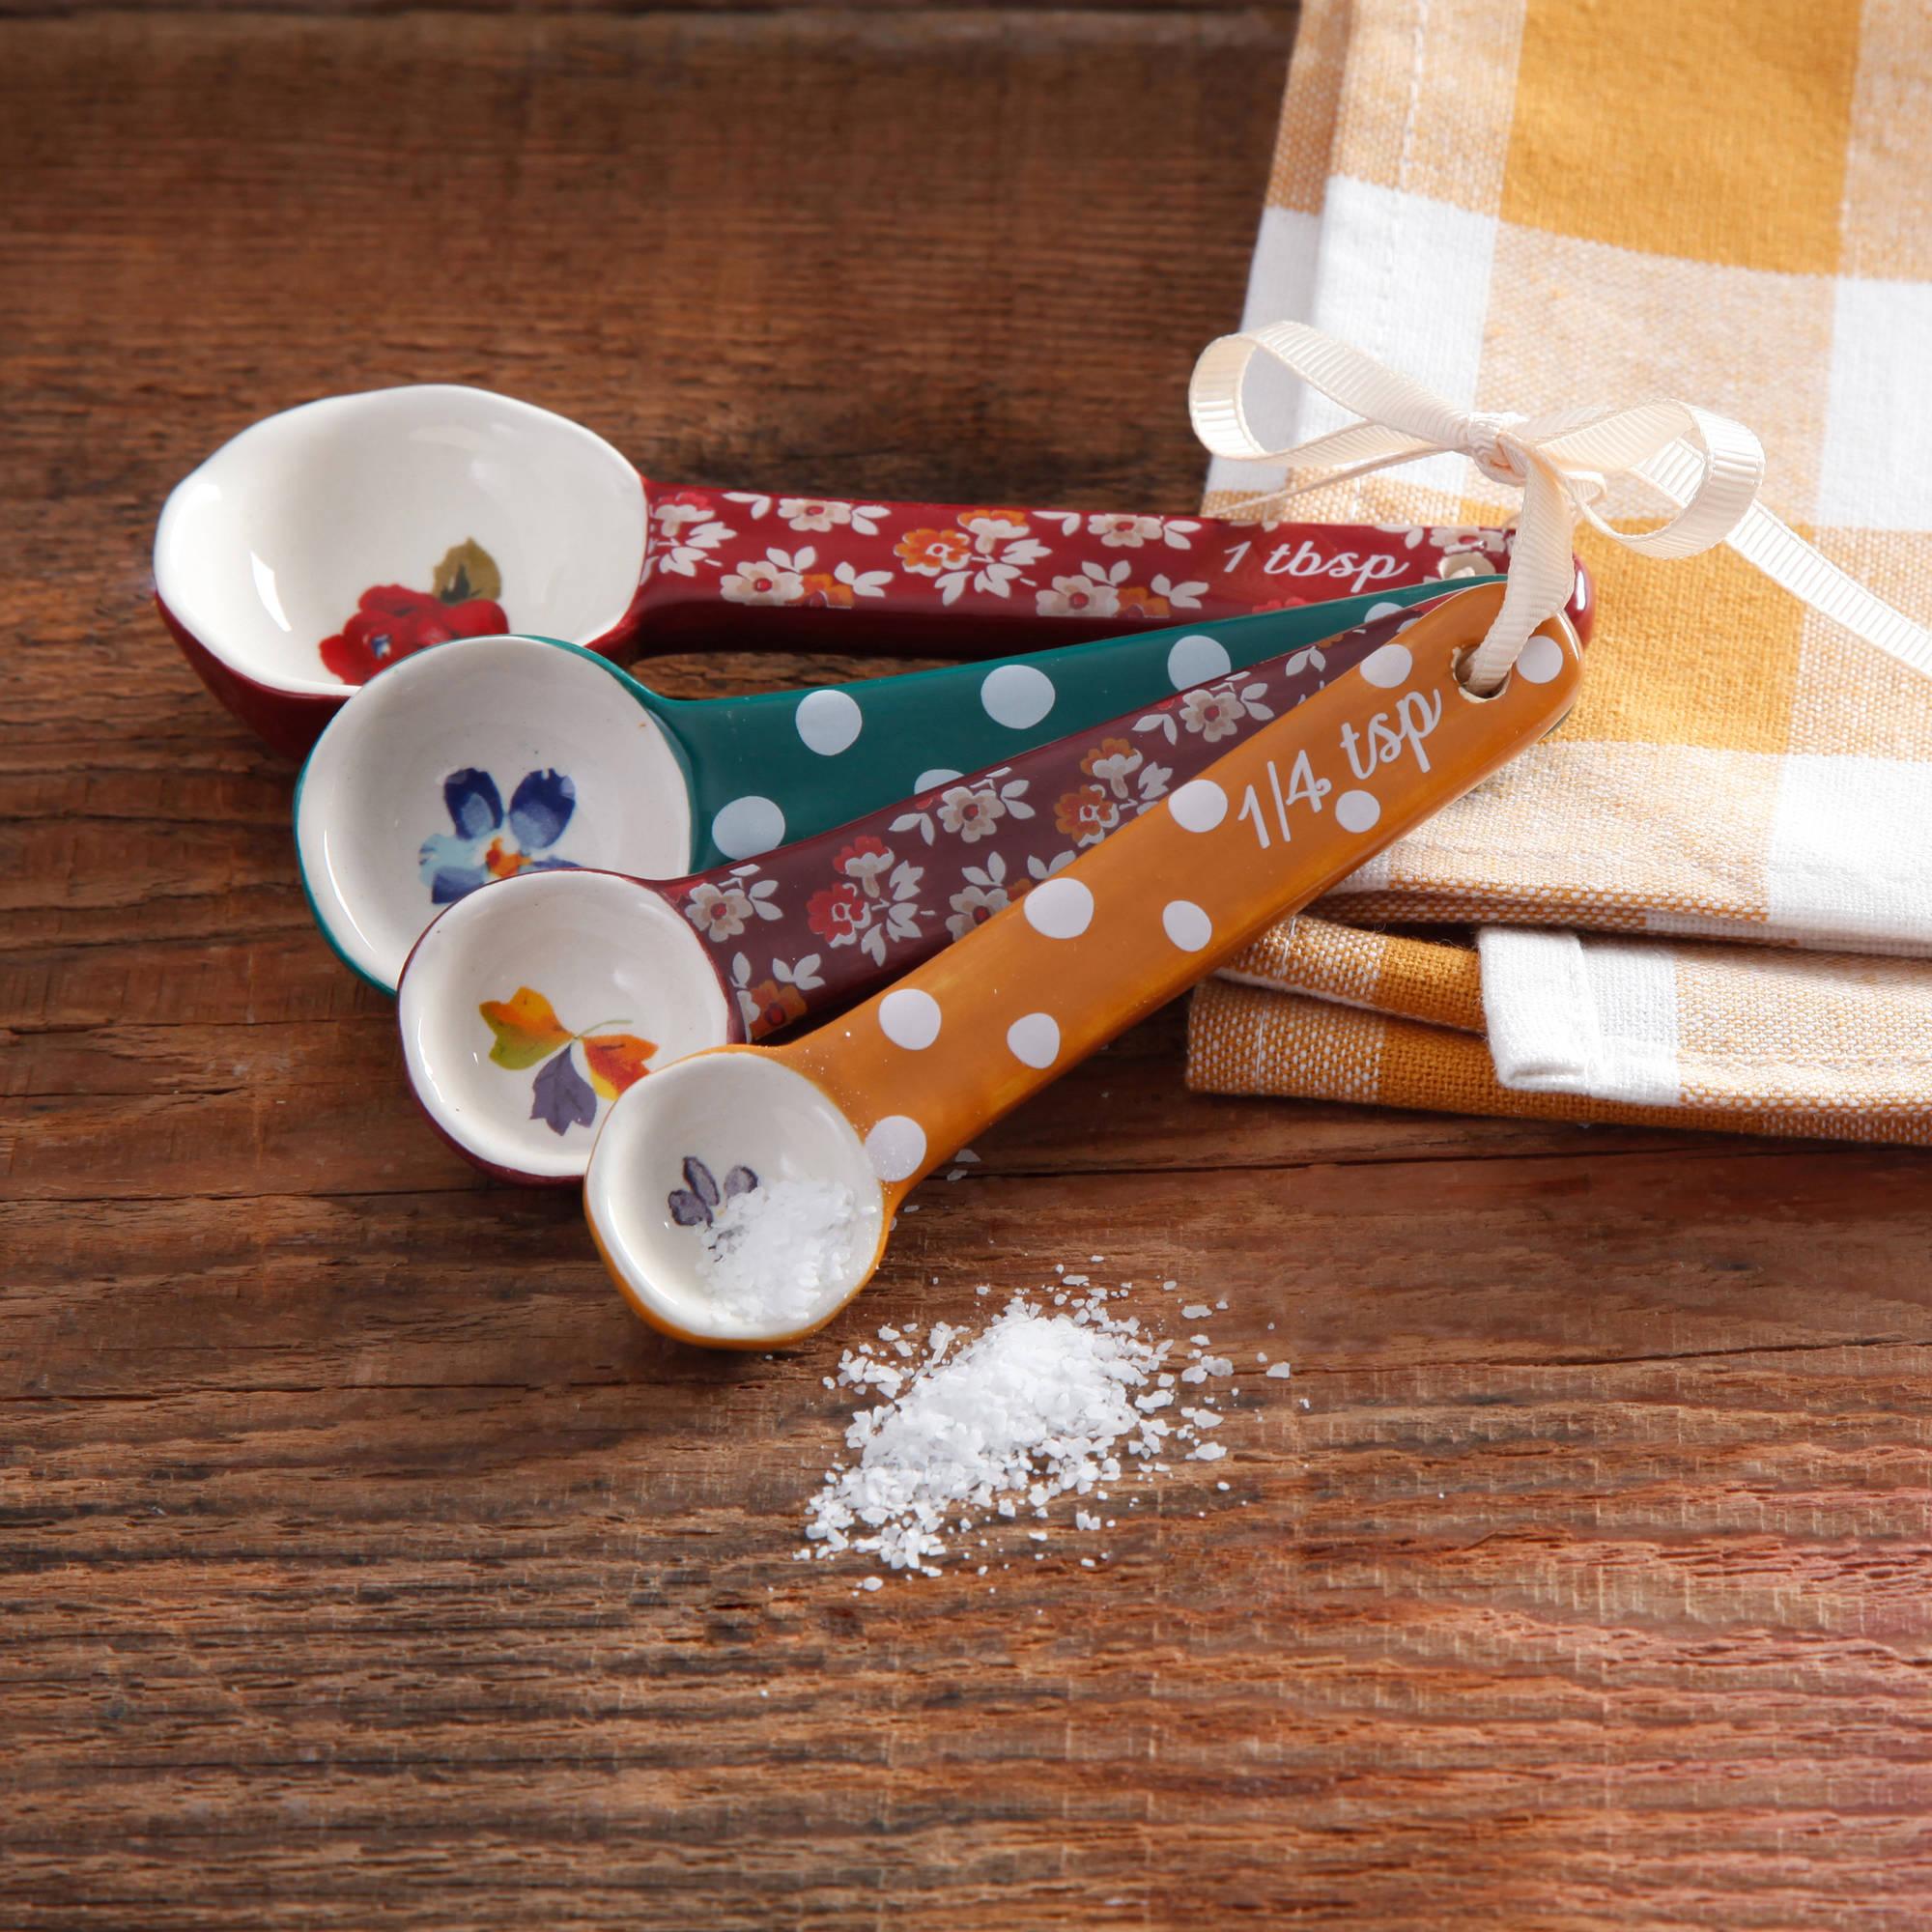 The Pioneer Woman Fall Flowers Ceramic Measuring Spoons